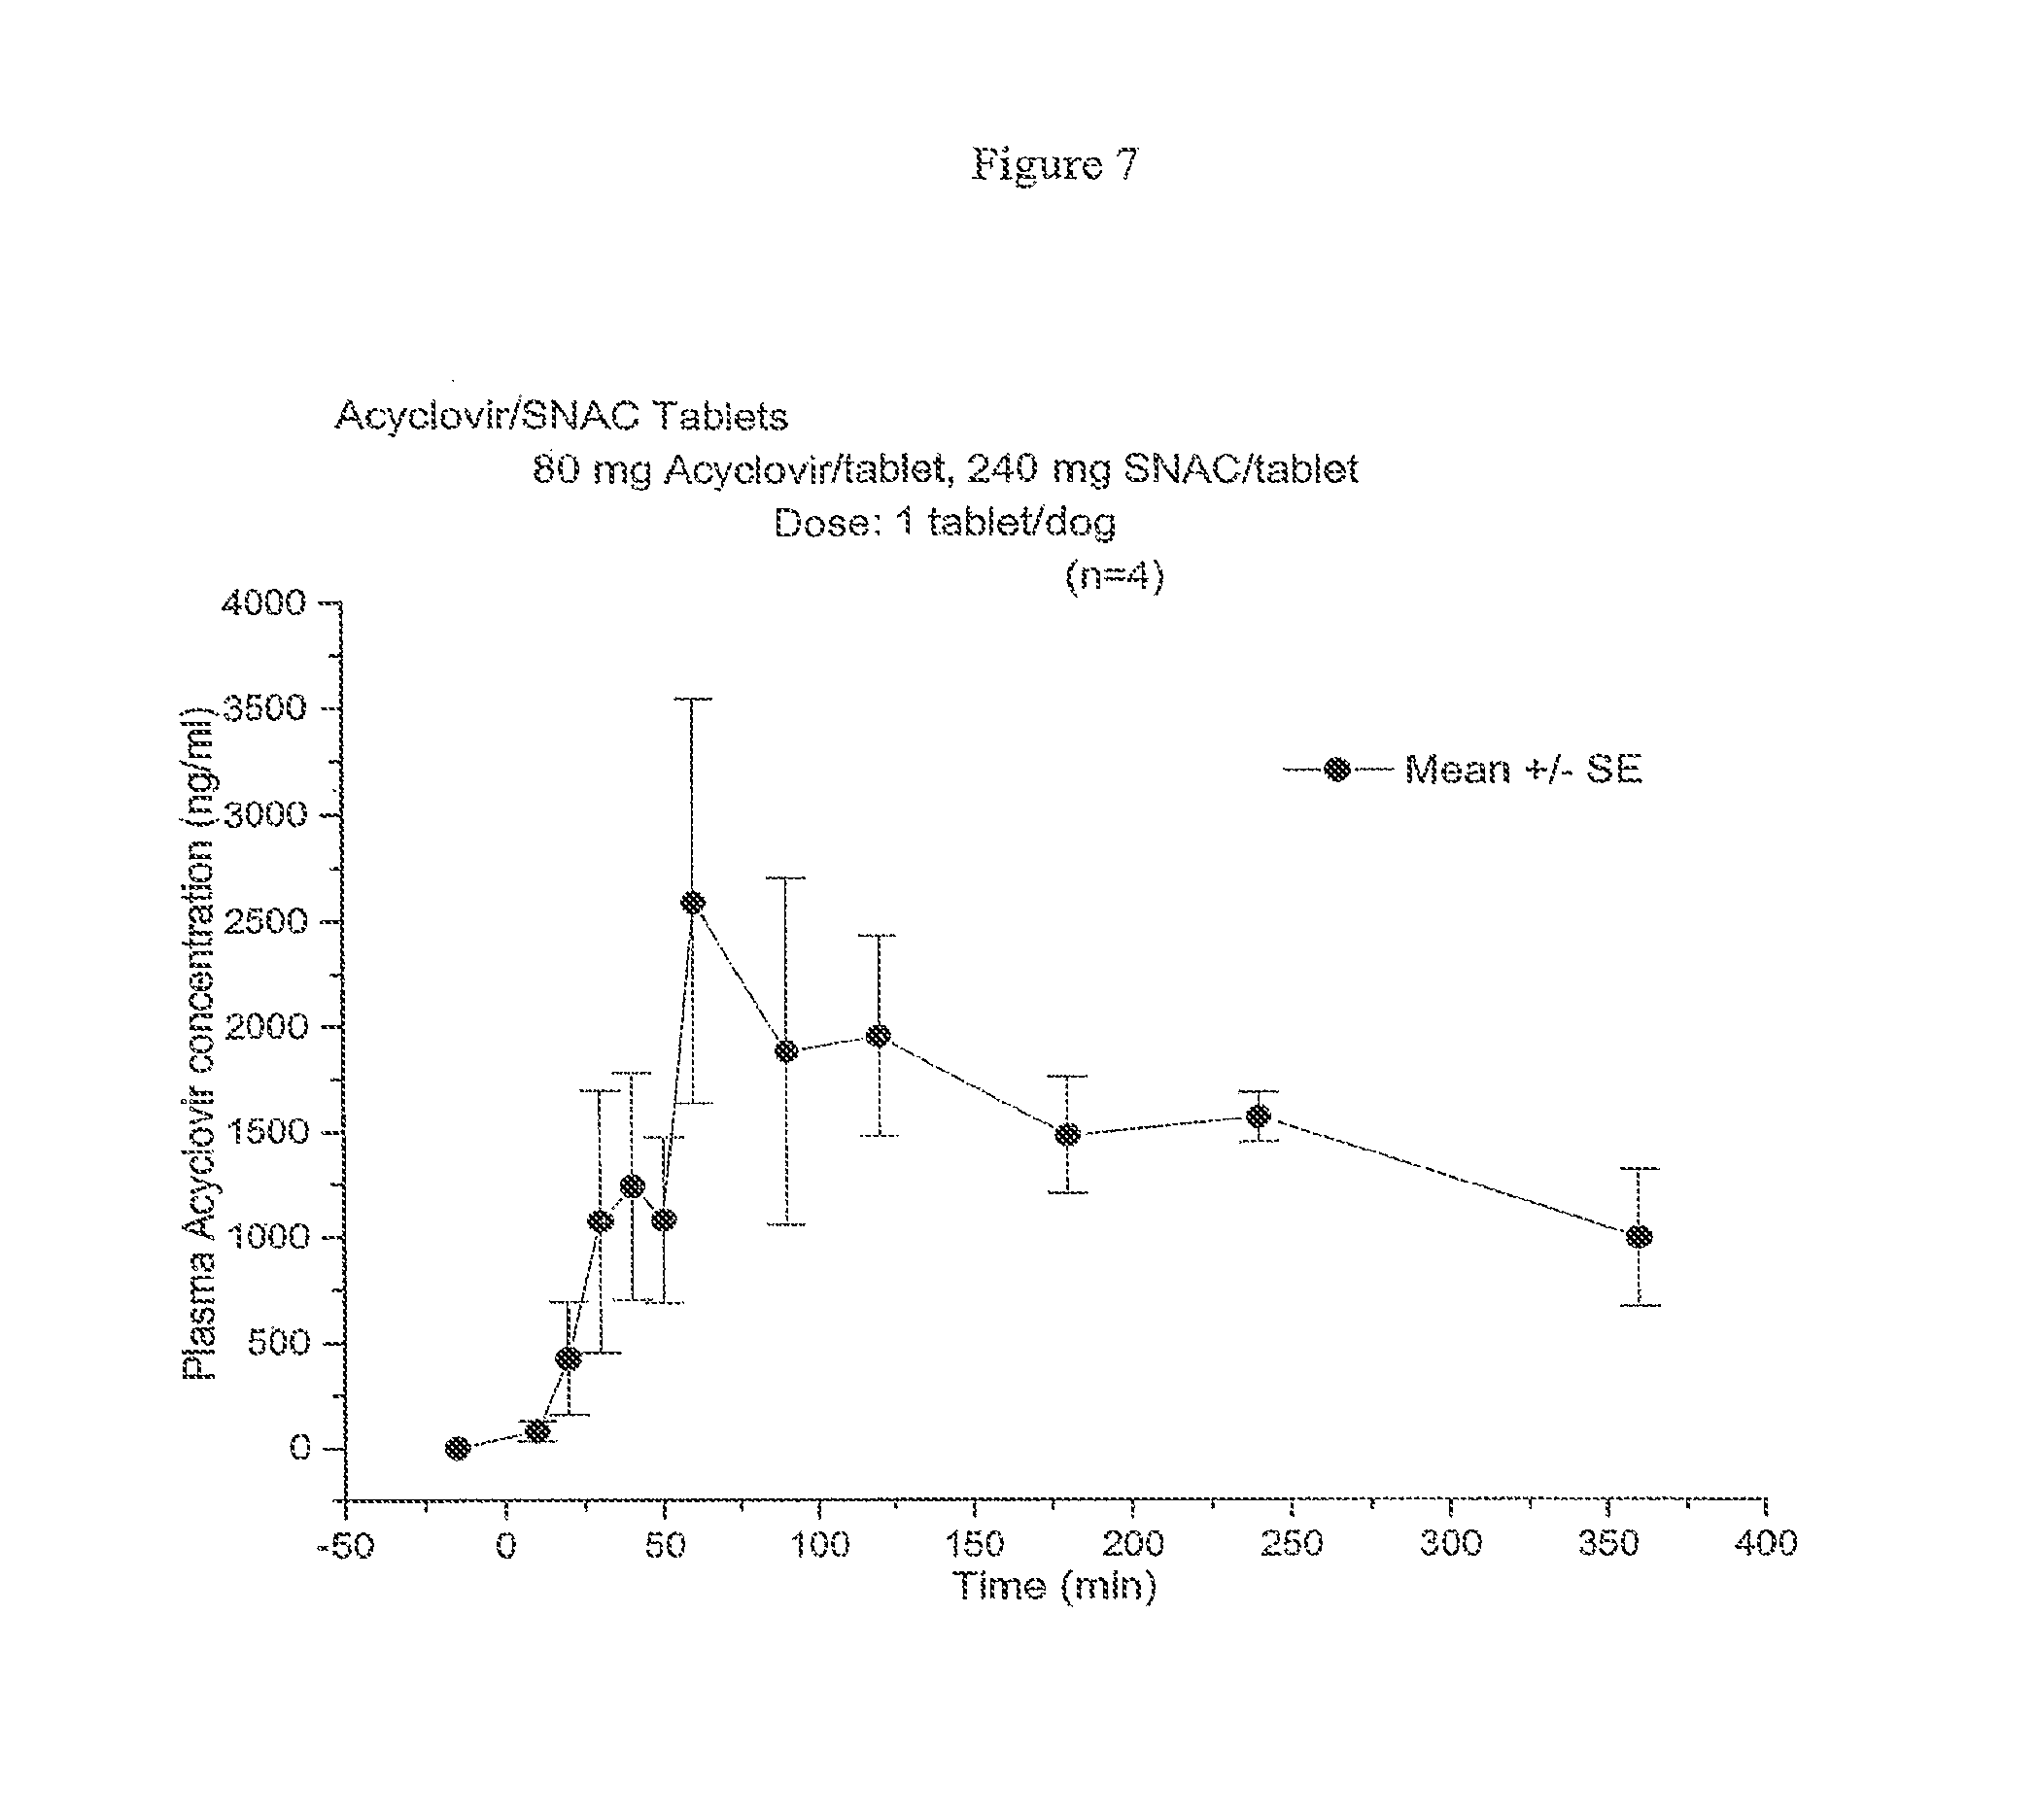 plaquenil 200 mg prices